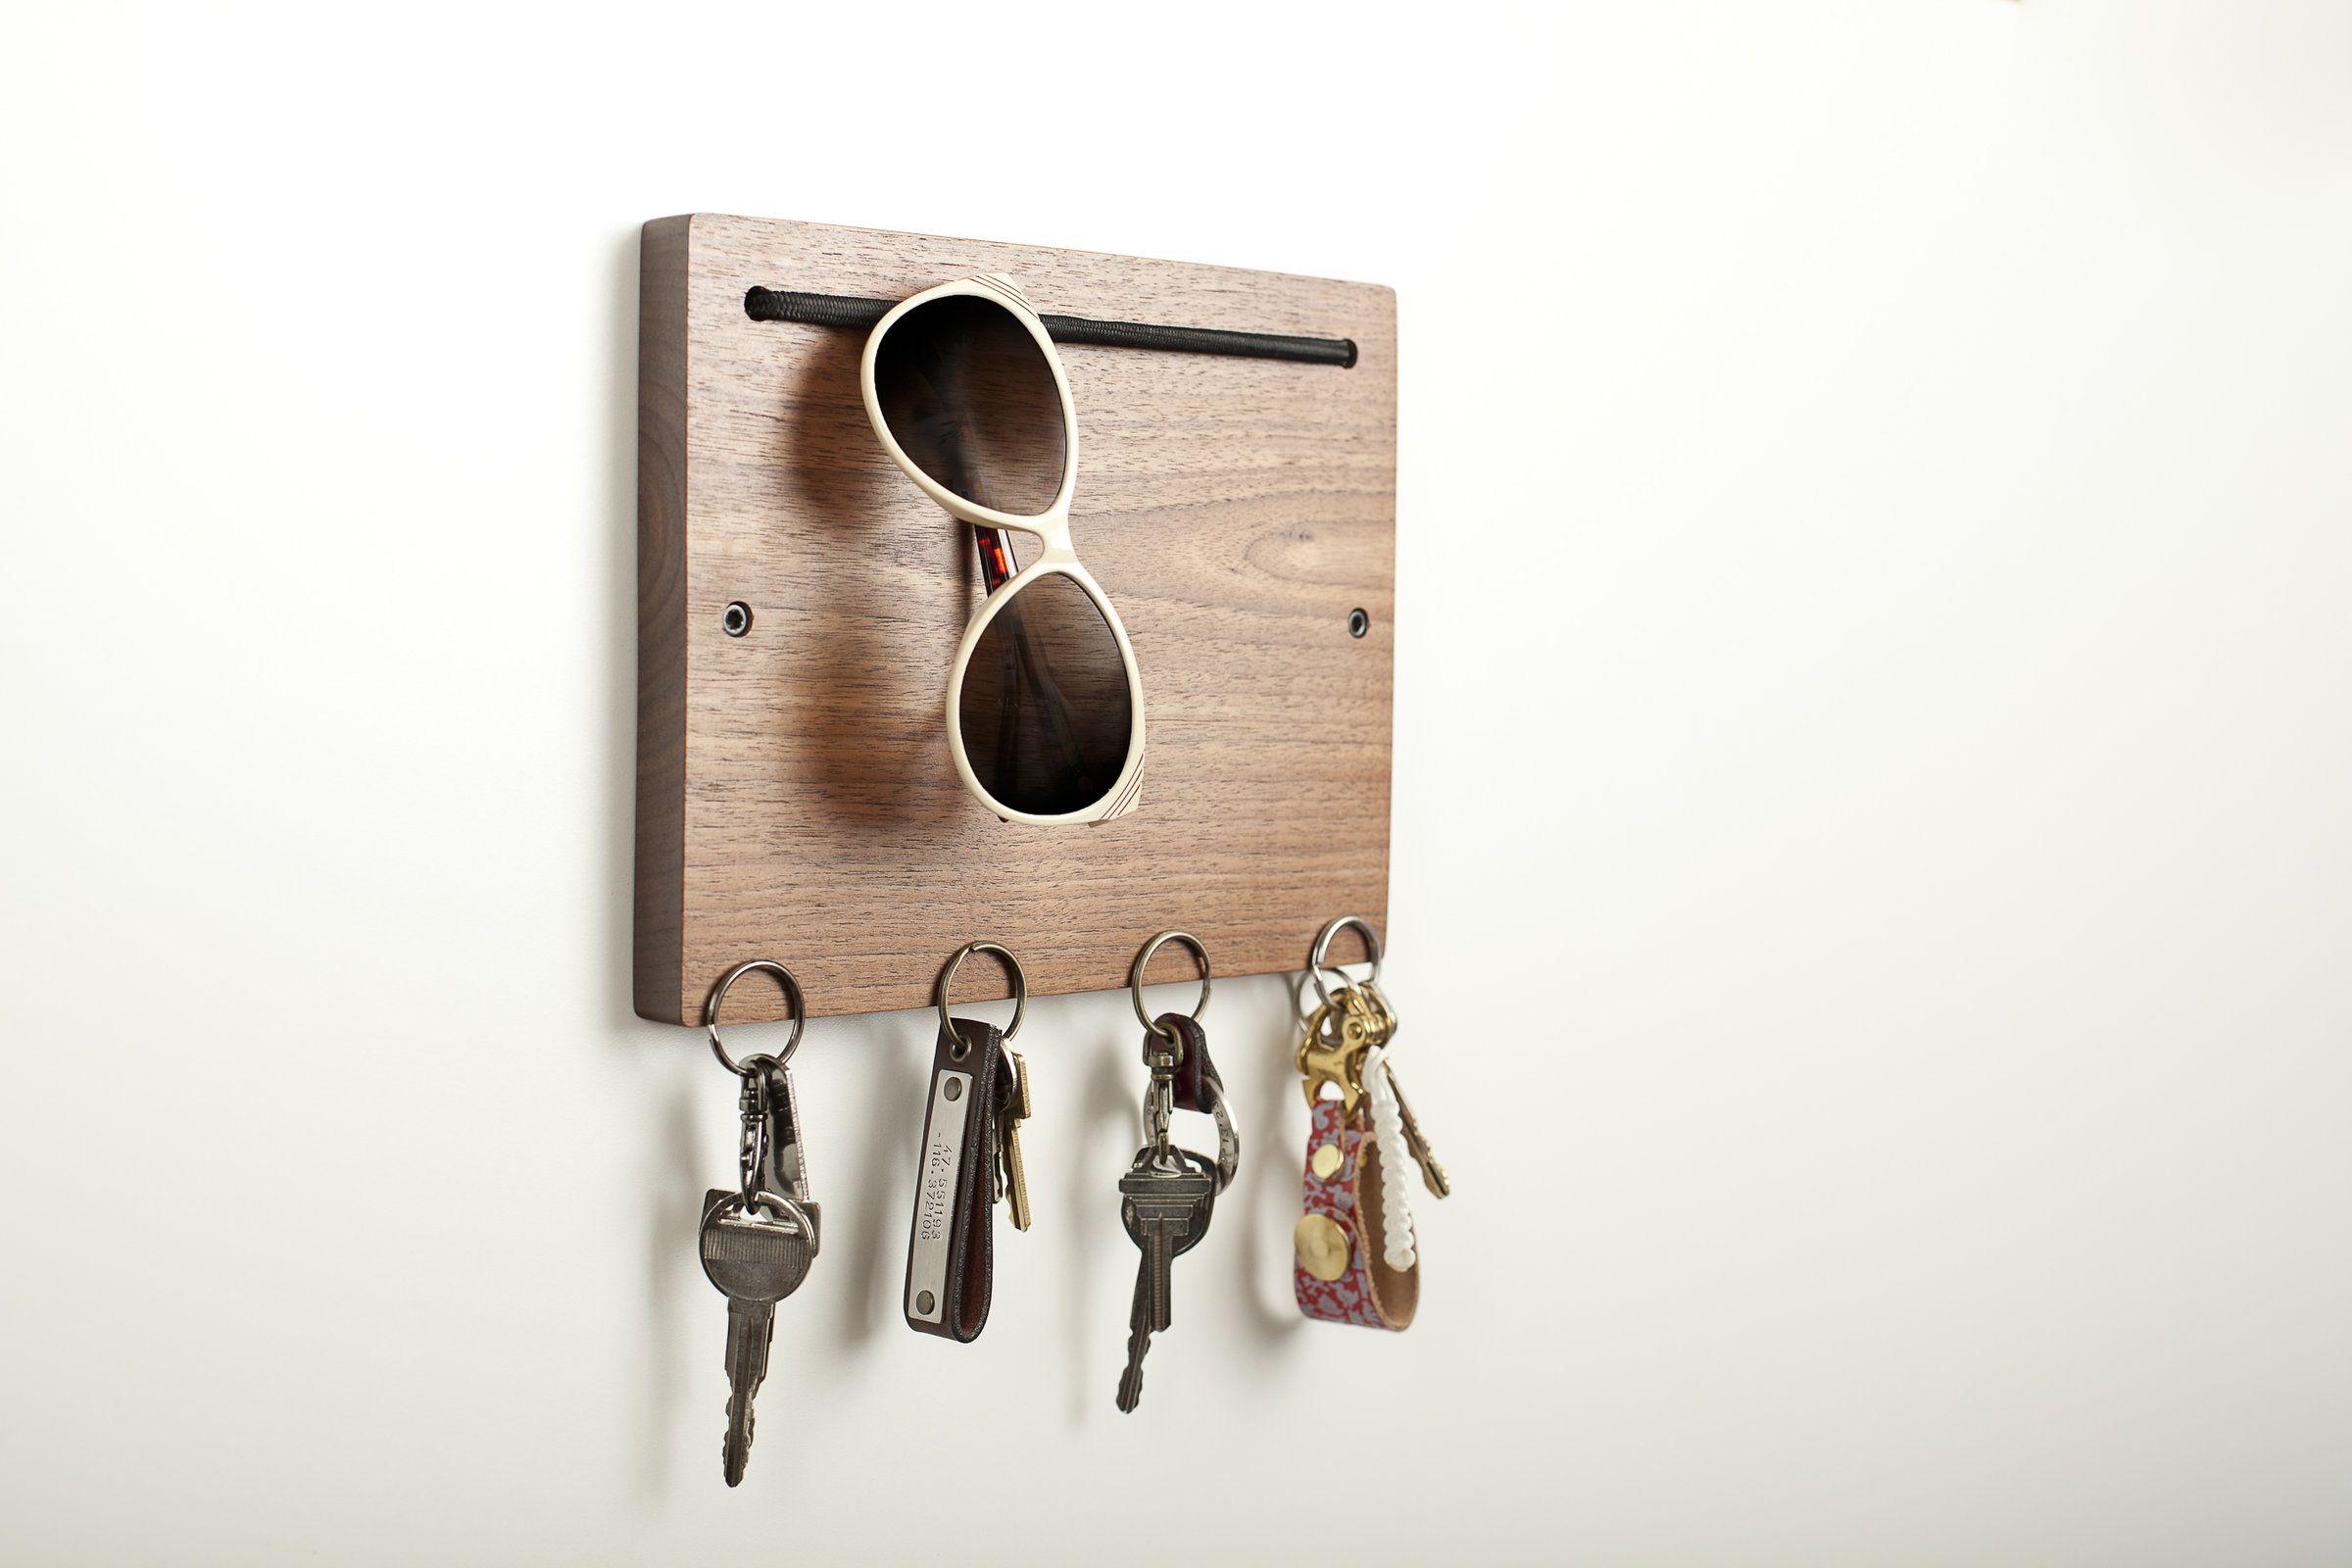 Blokkey Eyewear And Key Holder In Walnut By Brad Reed Nelson Wood Wall Organizer Artful Home Key Holder Diy Wooden Key Holder Wall Key Holder